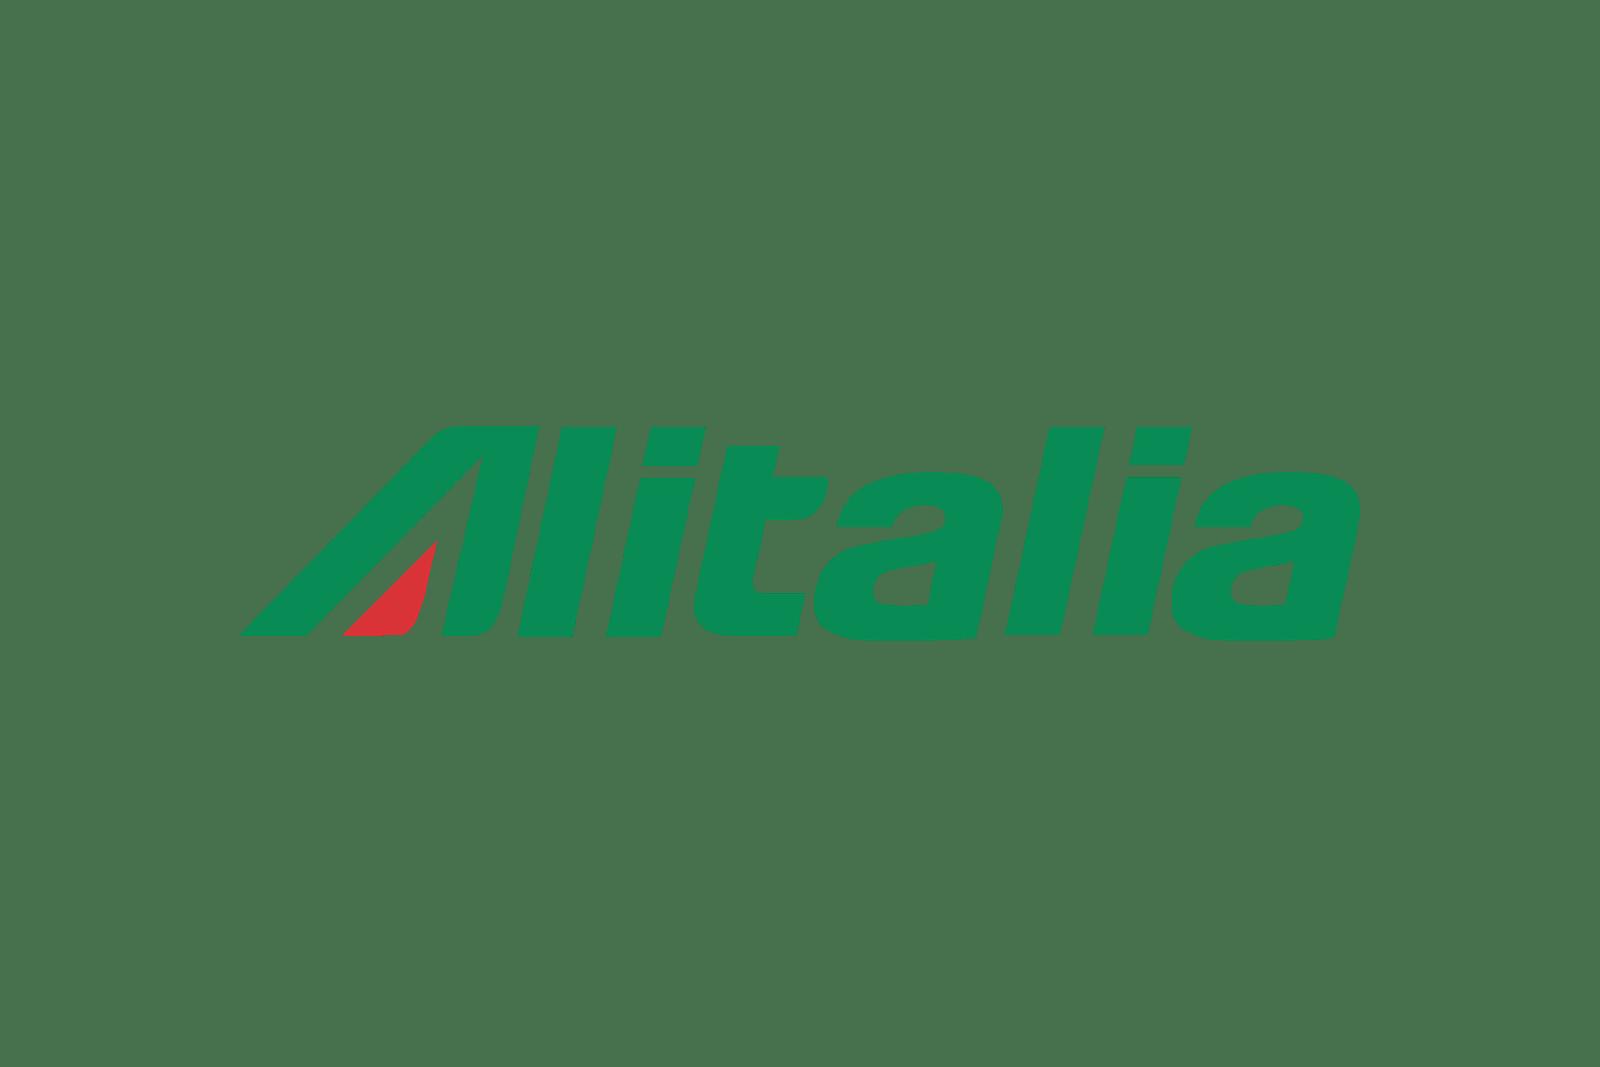 ALITALIA (Алиталия)